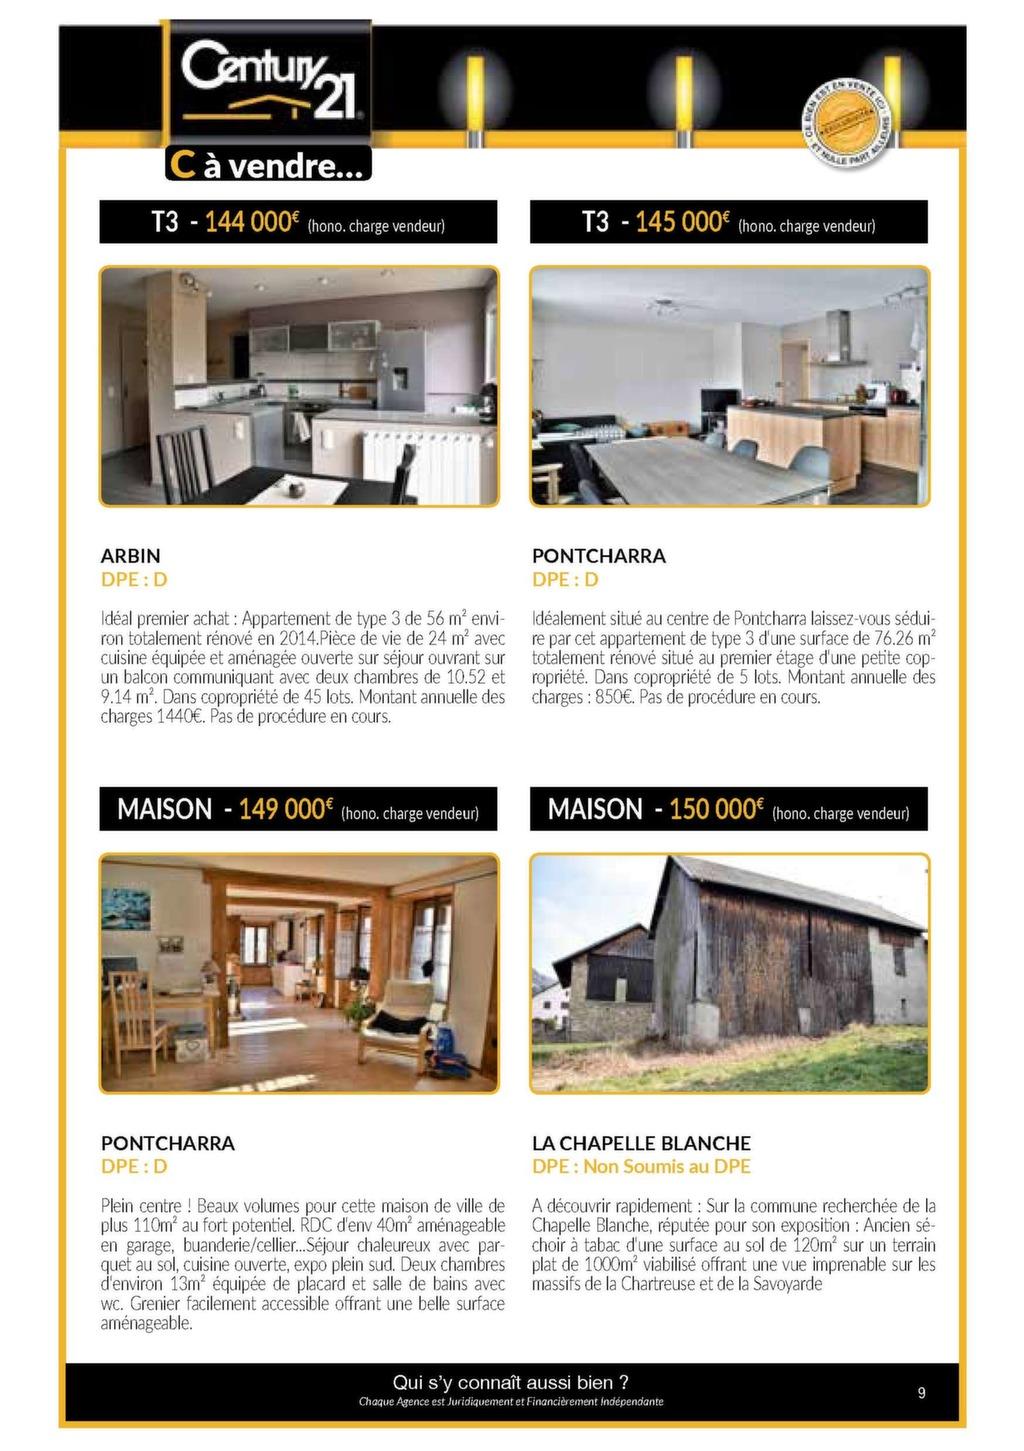 Century 21 Pontcharra Printemps Magazine Immo